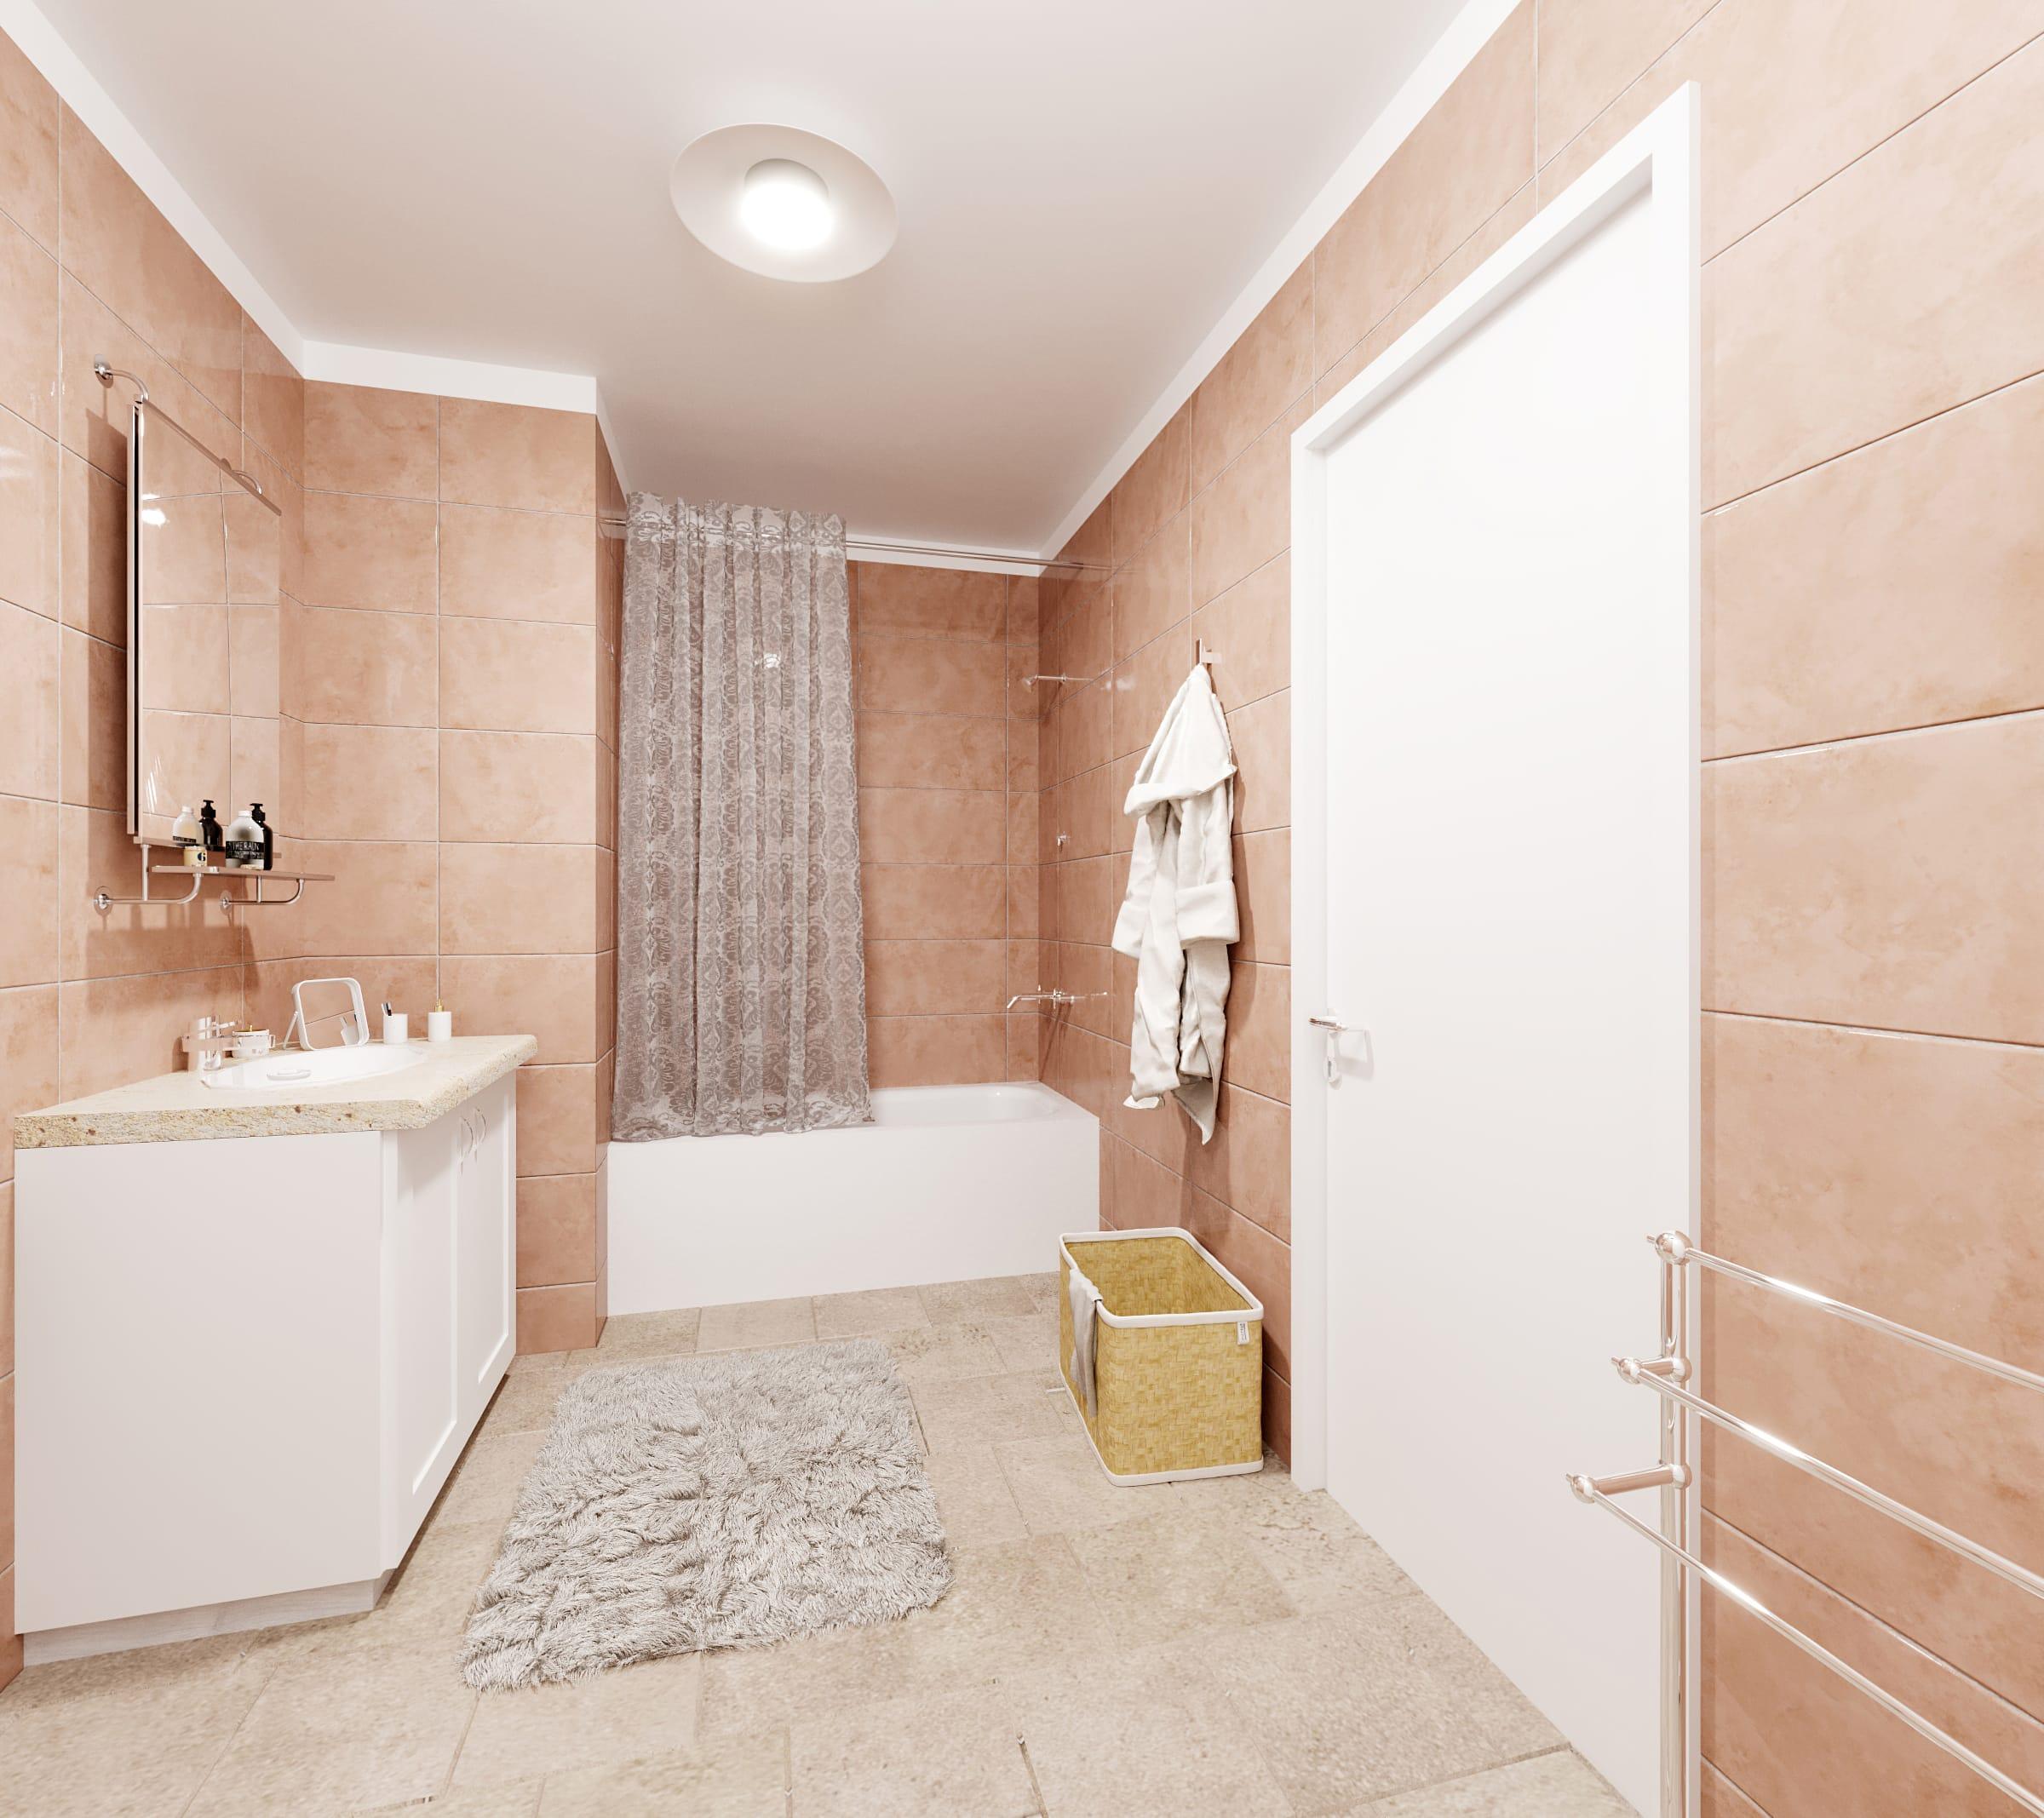 Salle de bain Avant ecoshower